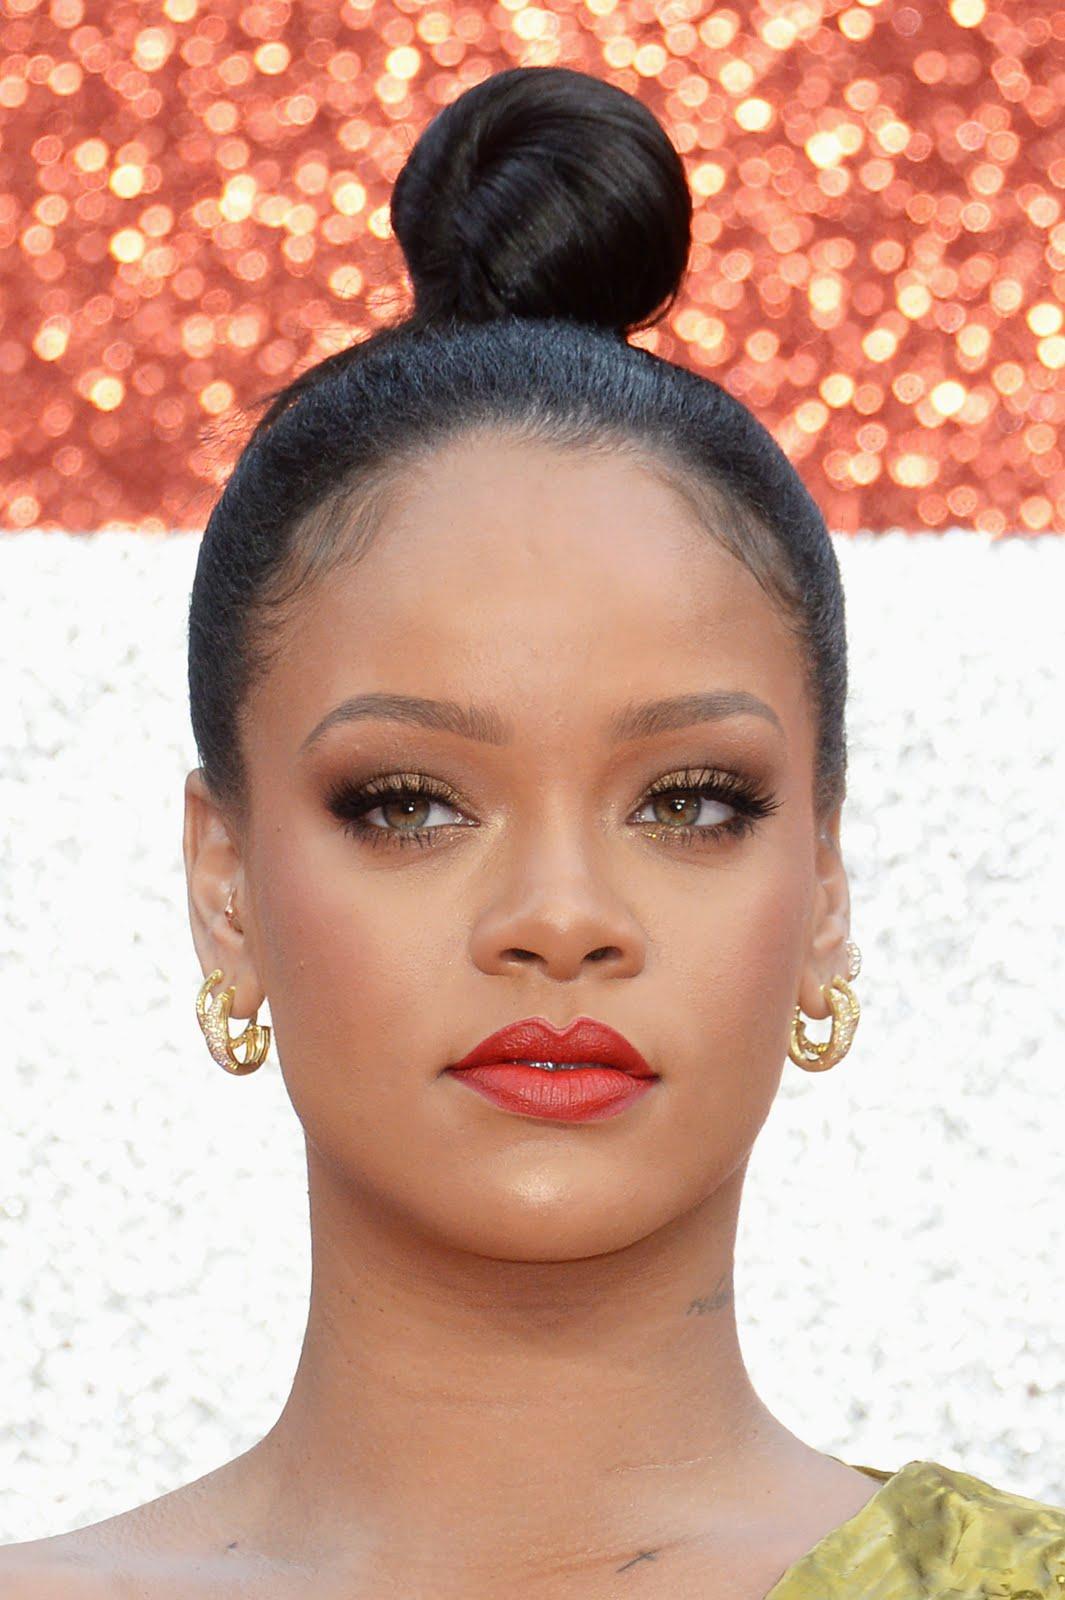 Rihanna x Ocean's 8 Première London